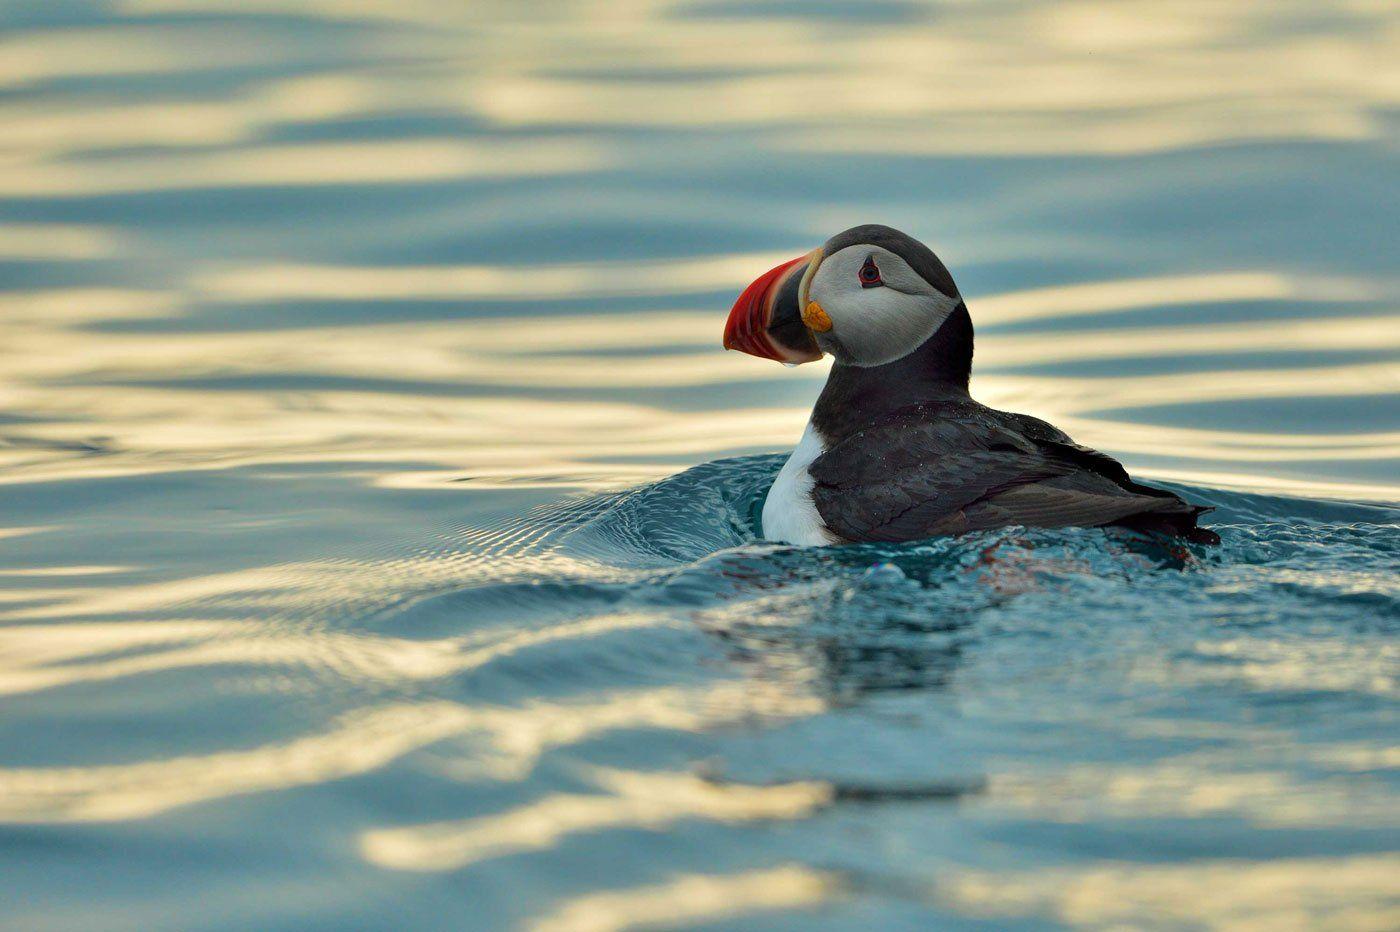 Арктика, Норвегия, Шпицберген, исландский тупик, птица, море, Анна Яценко